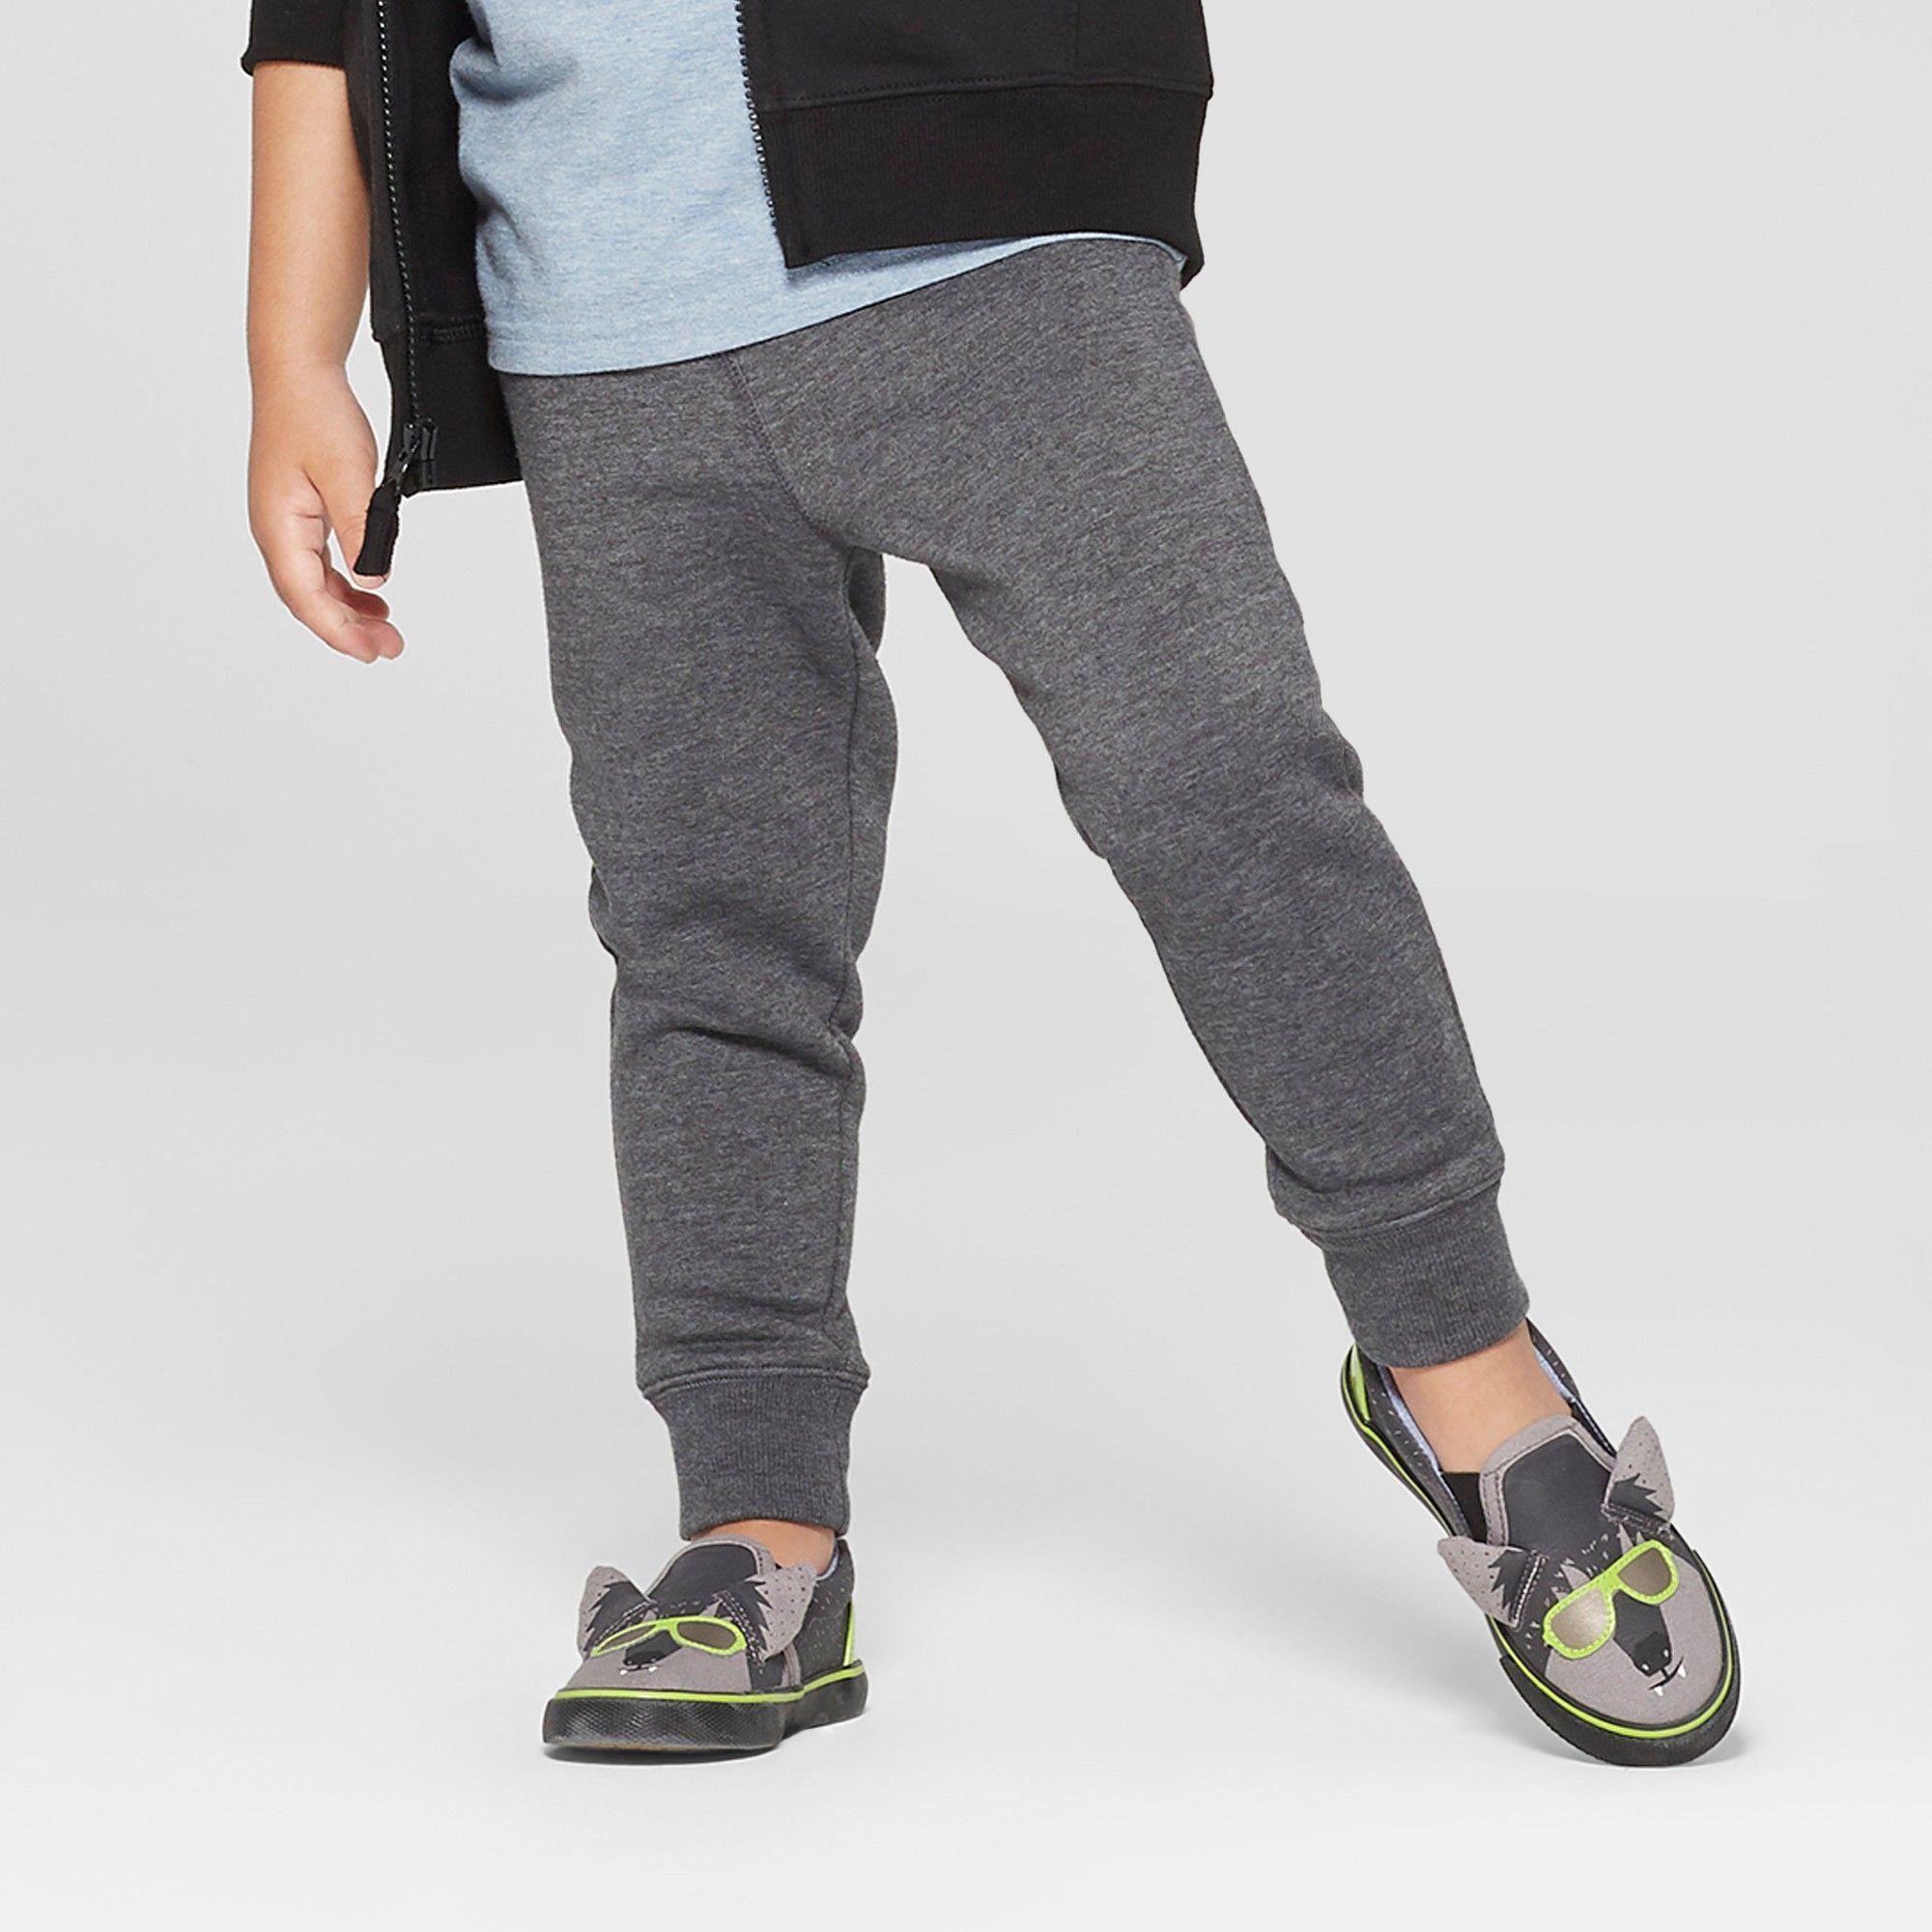 Cat /& Jack Boys Jogger Pants Gray Medium